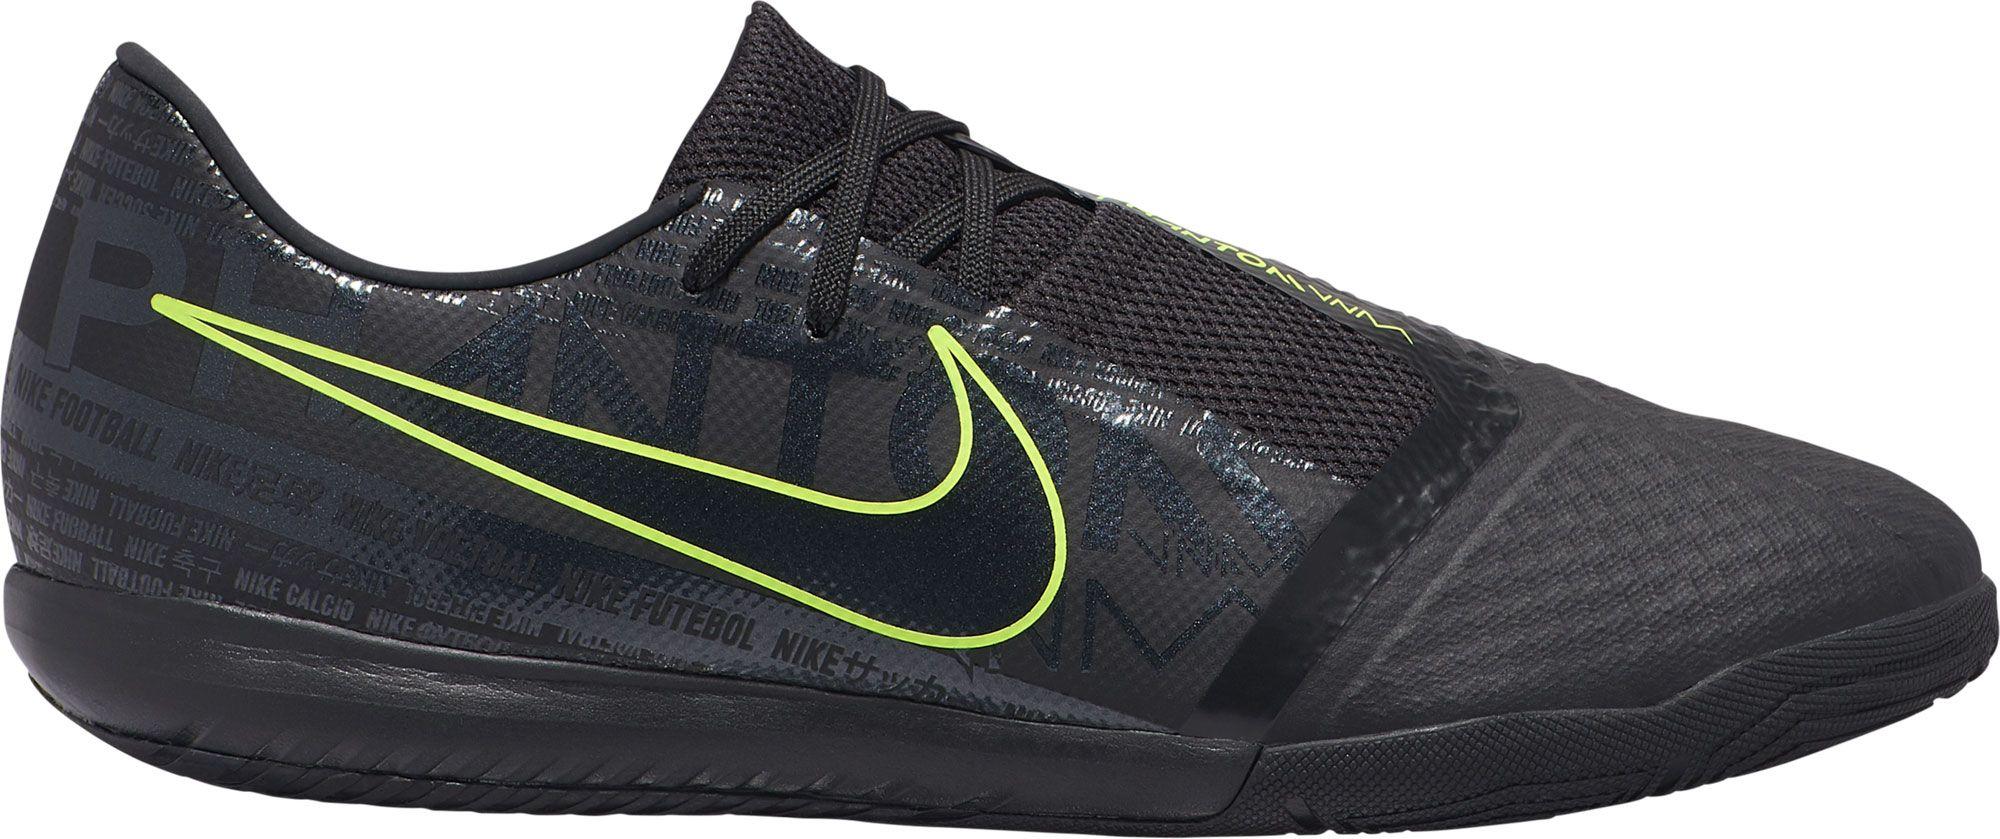 Nike Phantom Venom Academy Indoor Soccer Shoes, Men's, Black